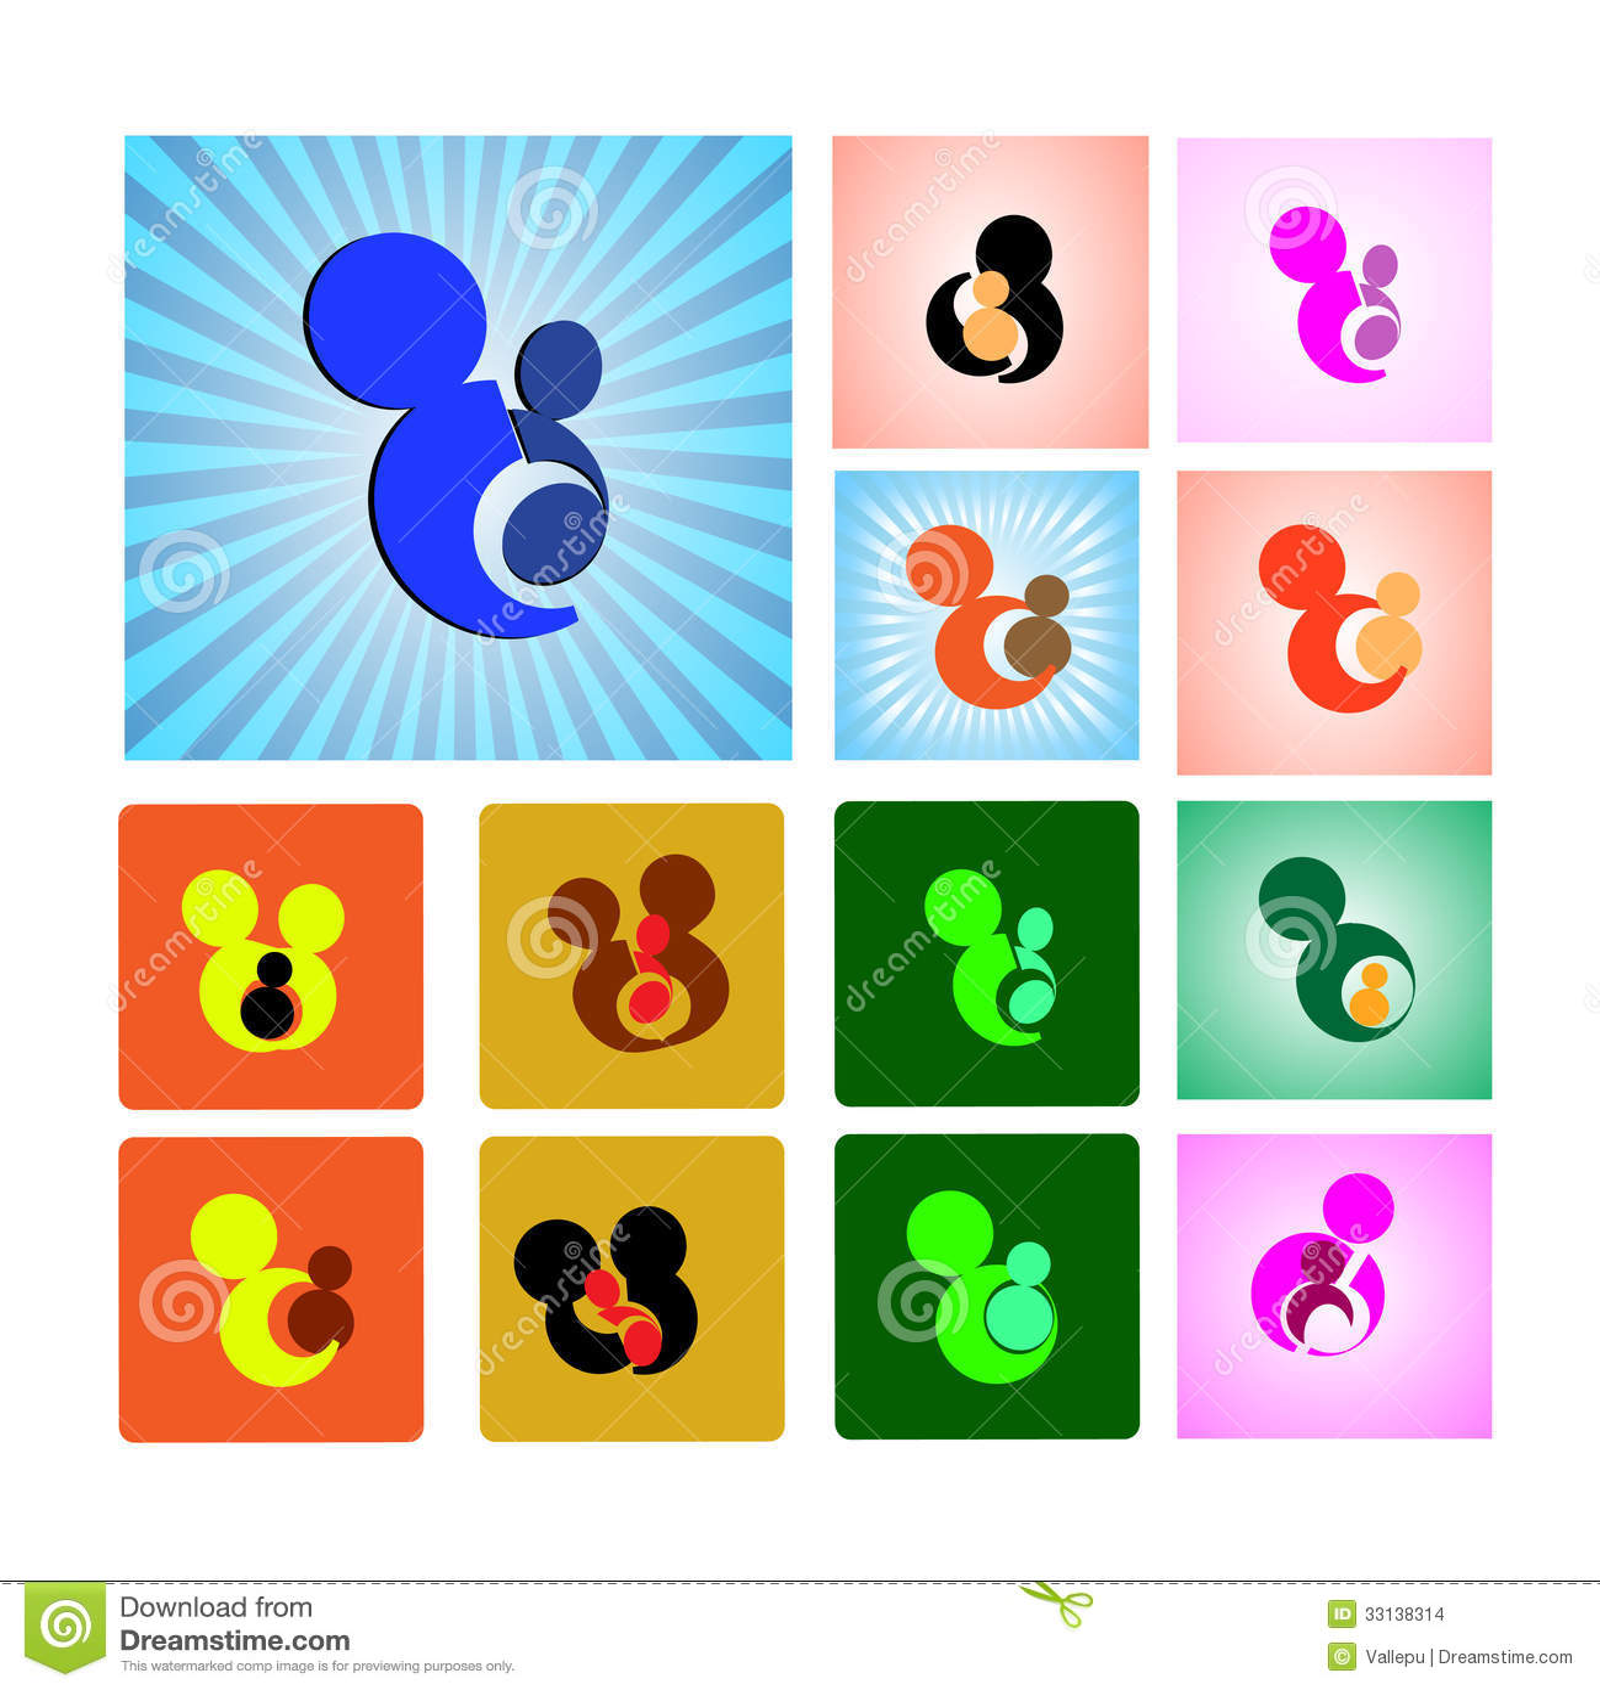 Sign Or Symbol Of Mother And Child Illustration 33138314 Megapixl